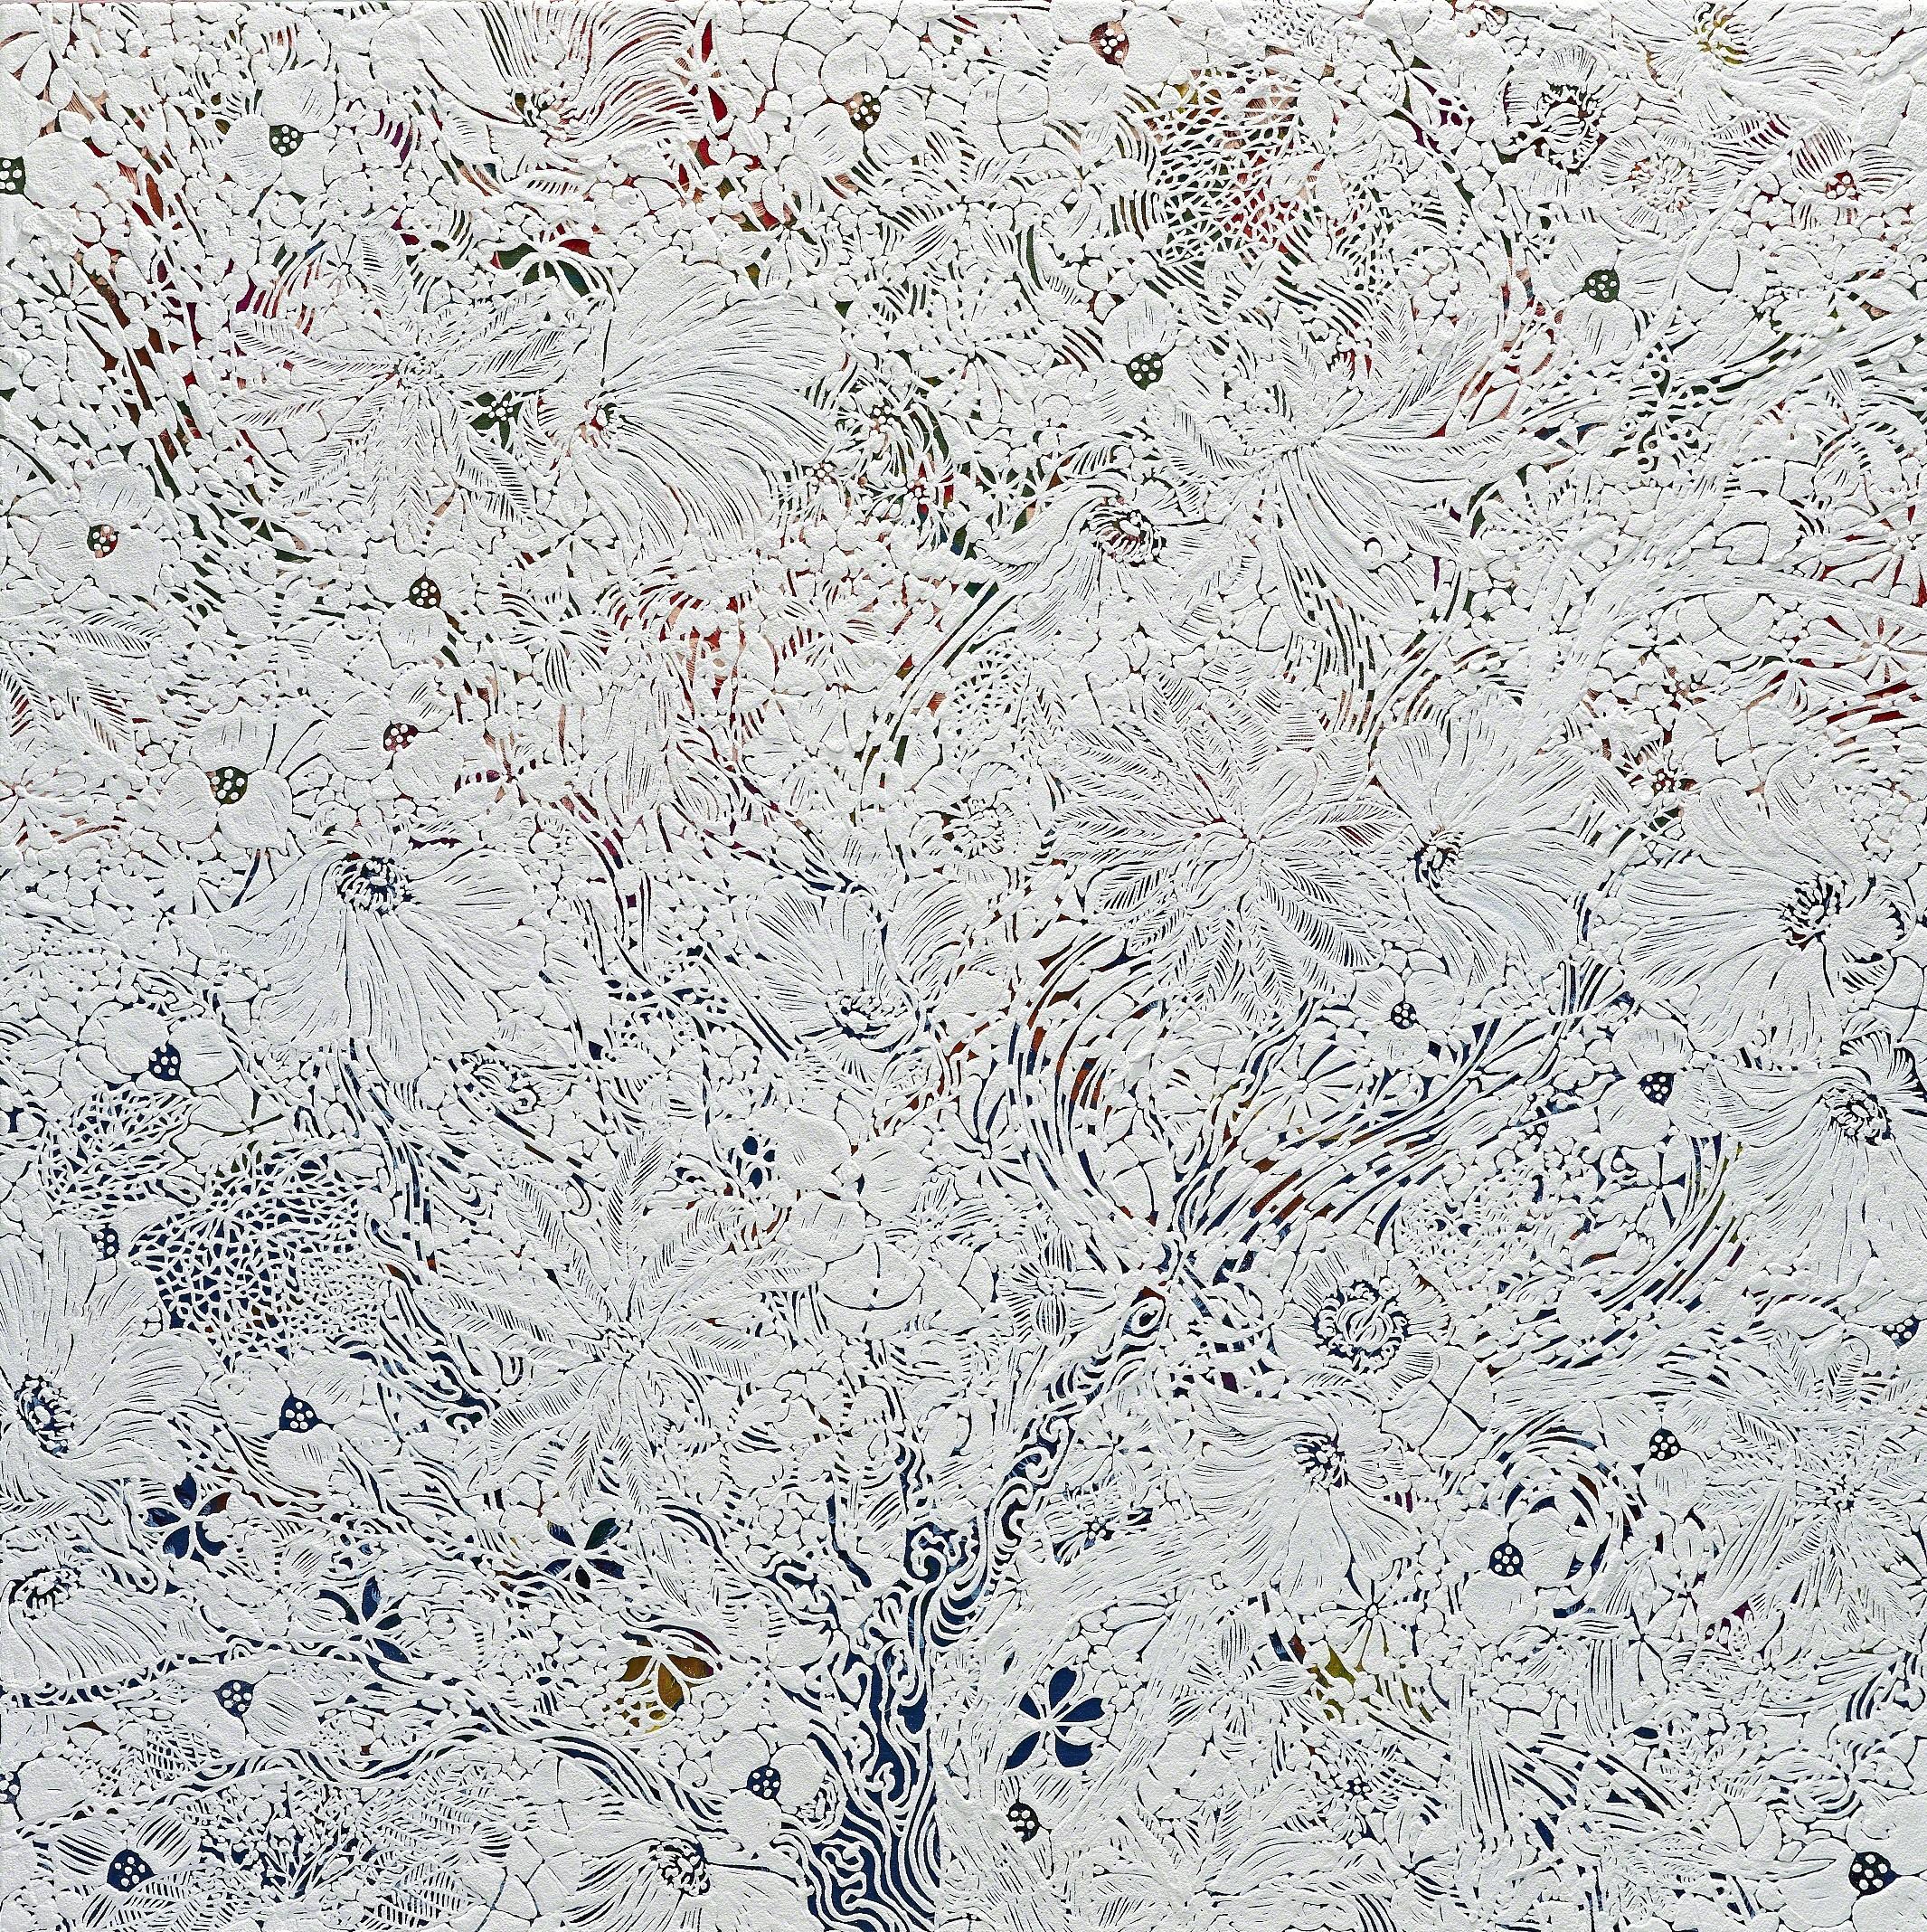 , 'Echoes-crystallization,' 2013, Mind Set Art Center